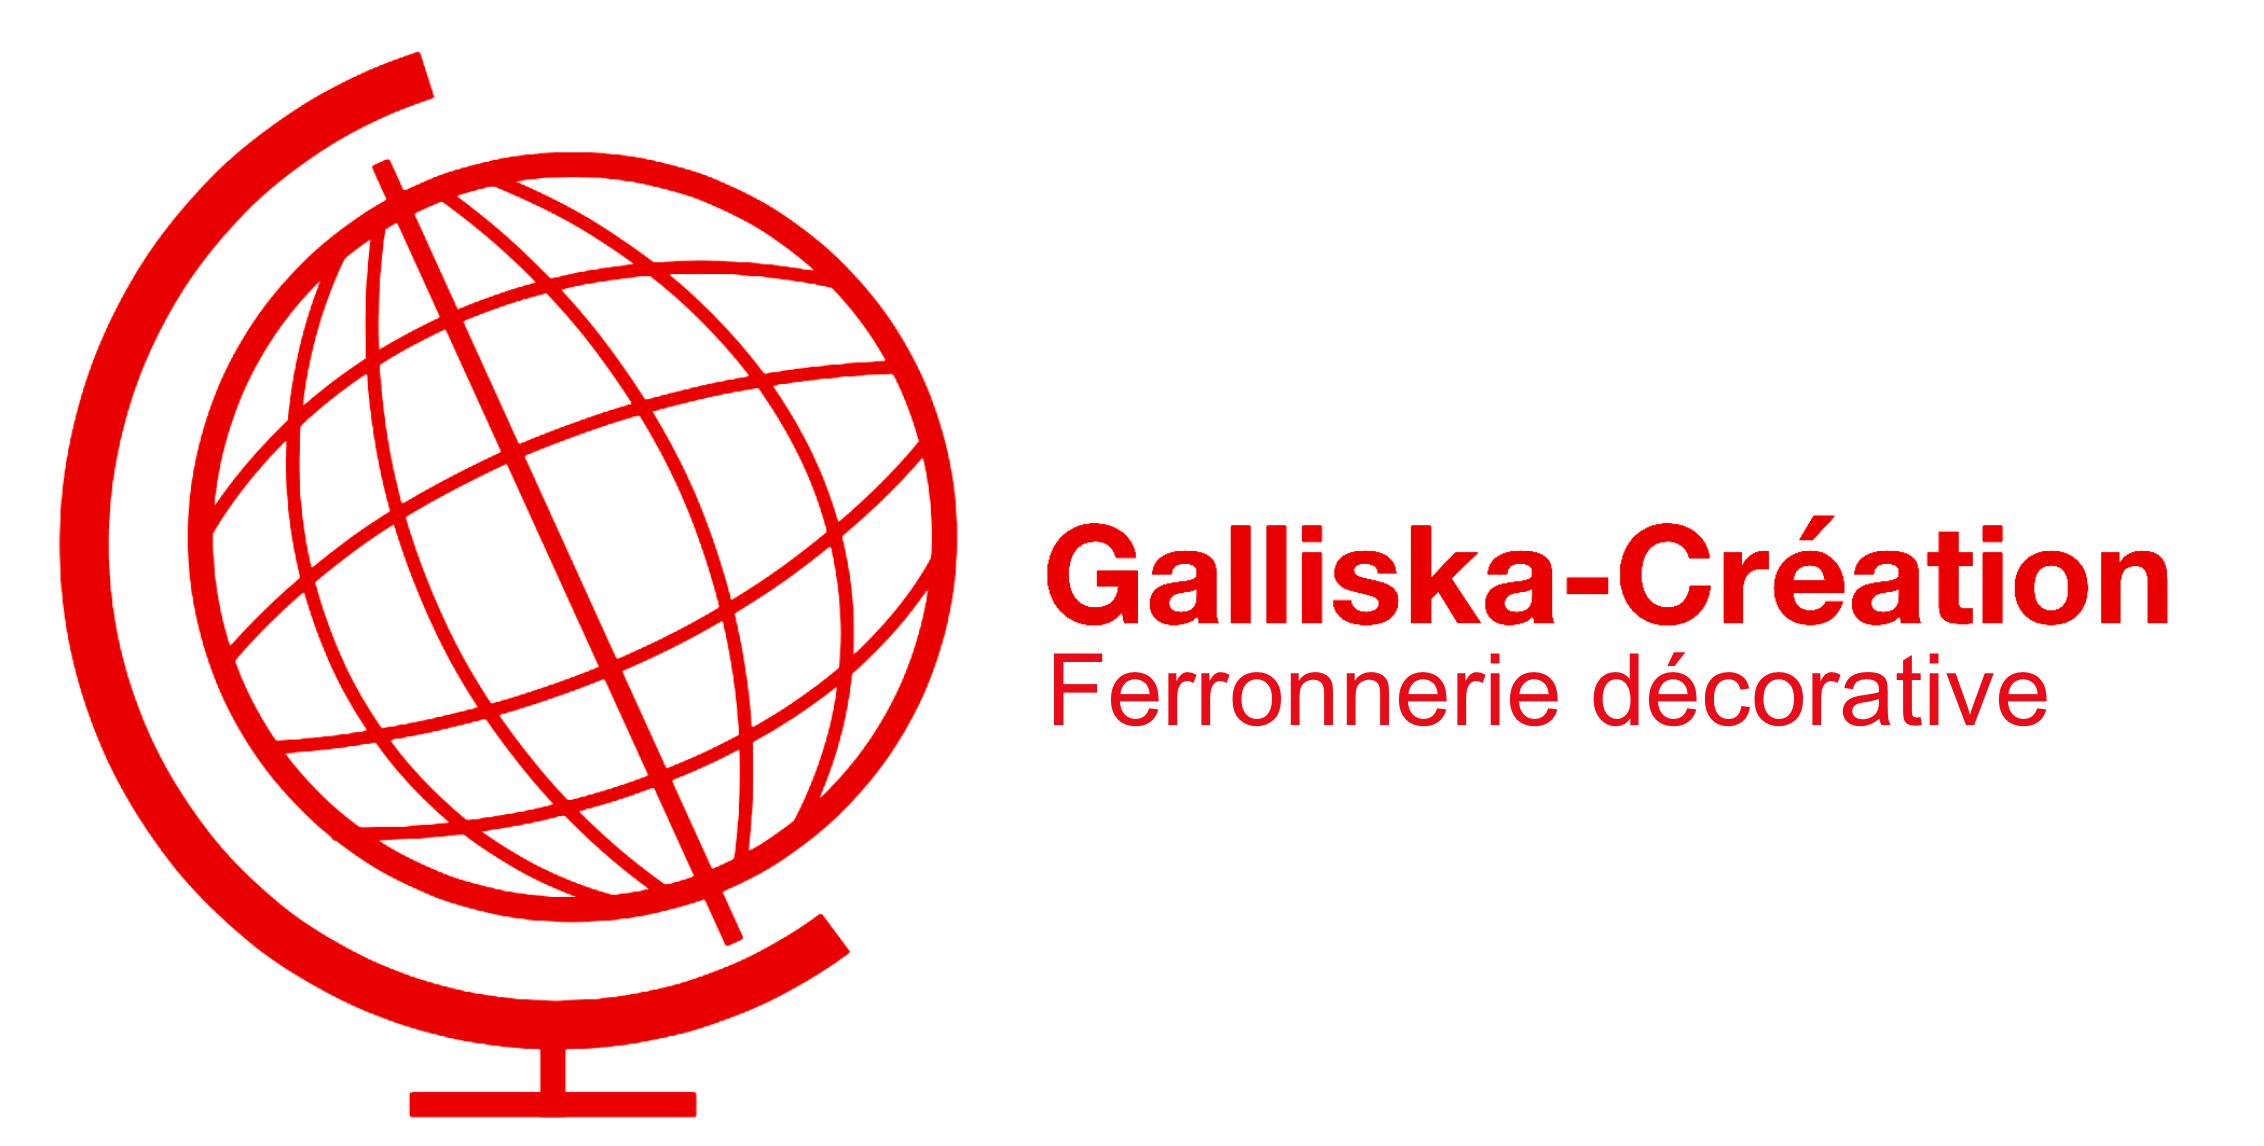 Galliska-Création